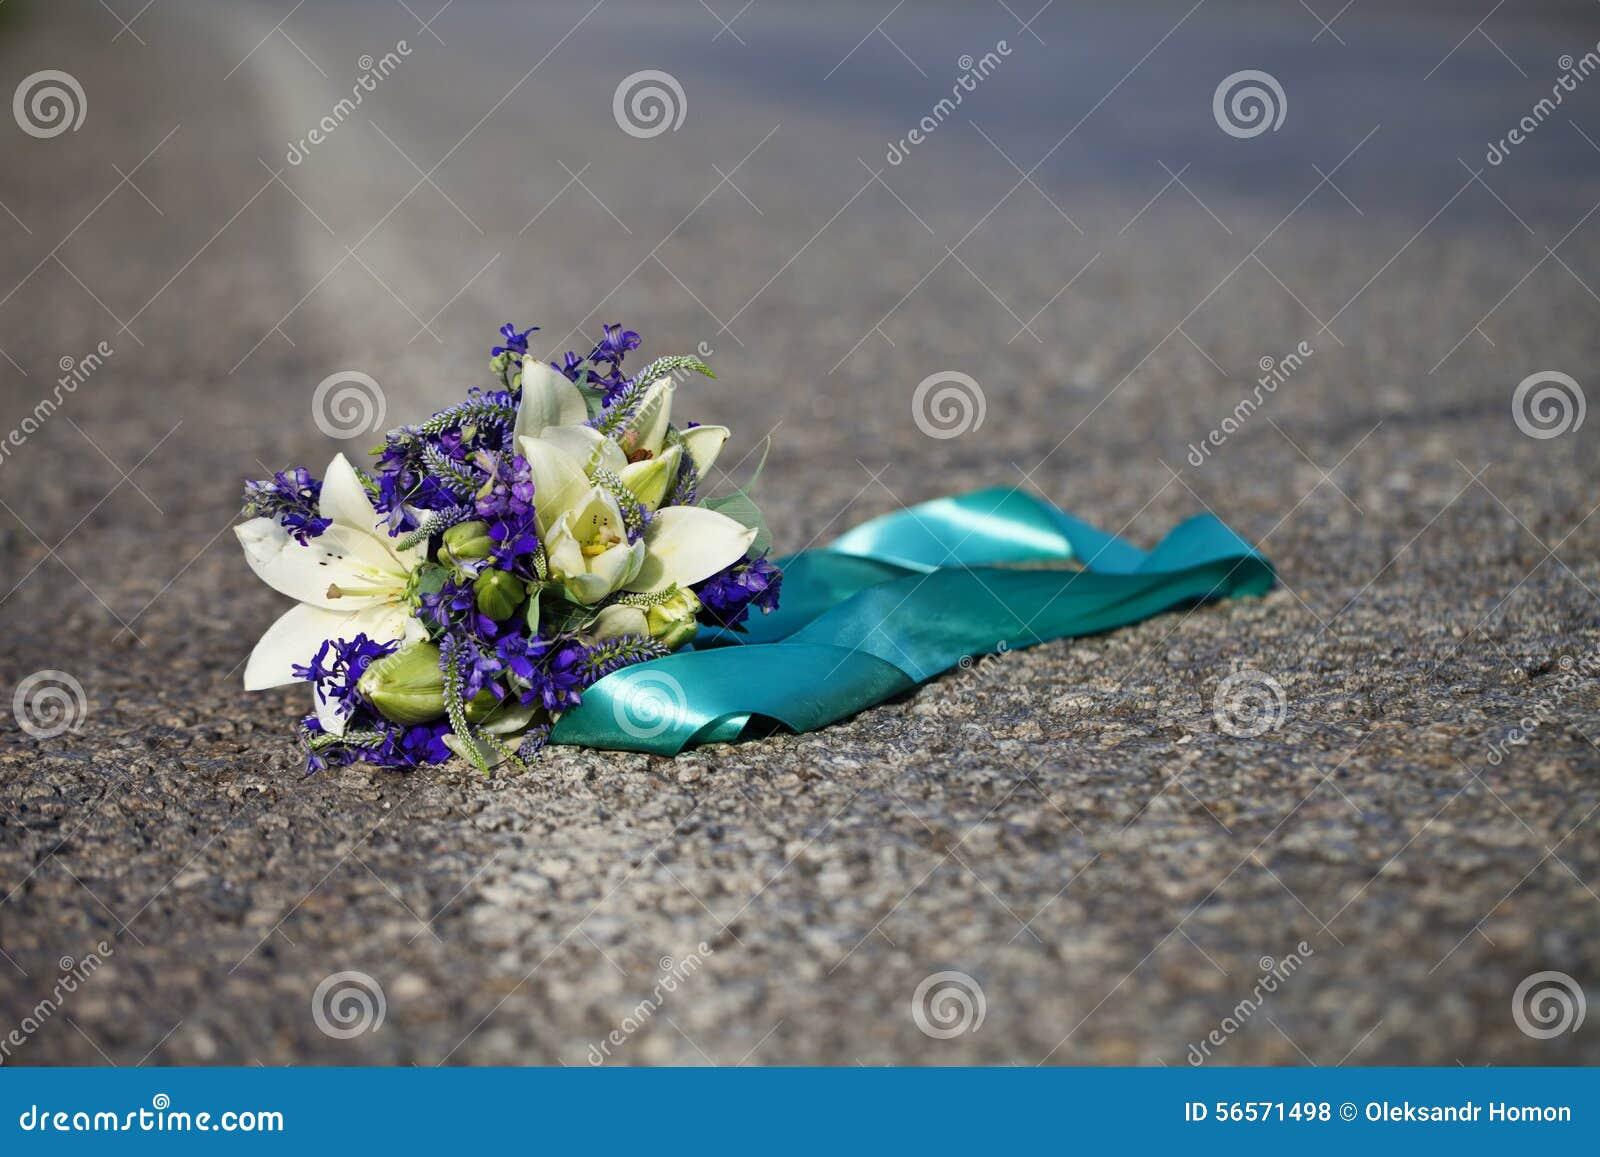 Download Νυφική ανθοδέσμη των κρίνων Στοκ Εικόνες - εικόνα από ανασκόπησης, γάμος: 56571498